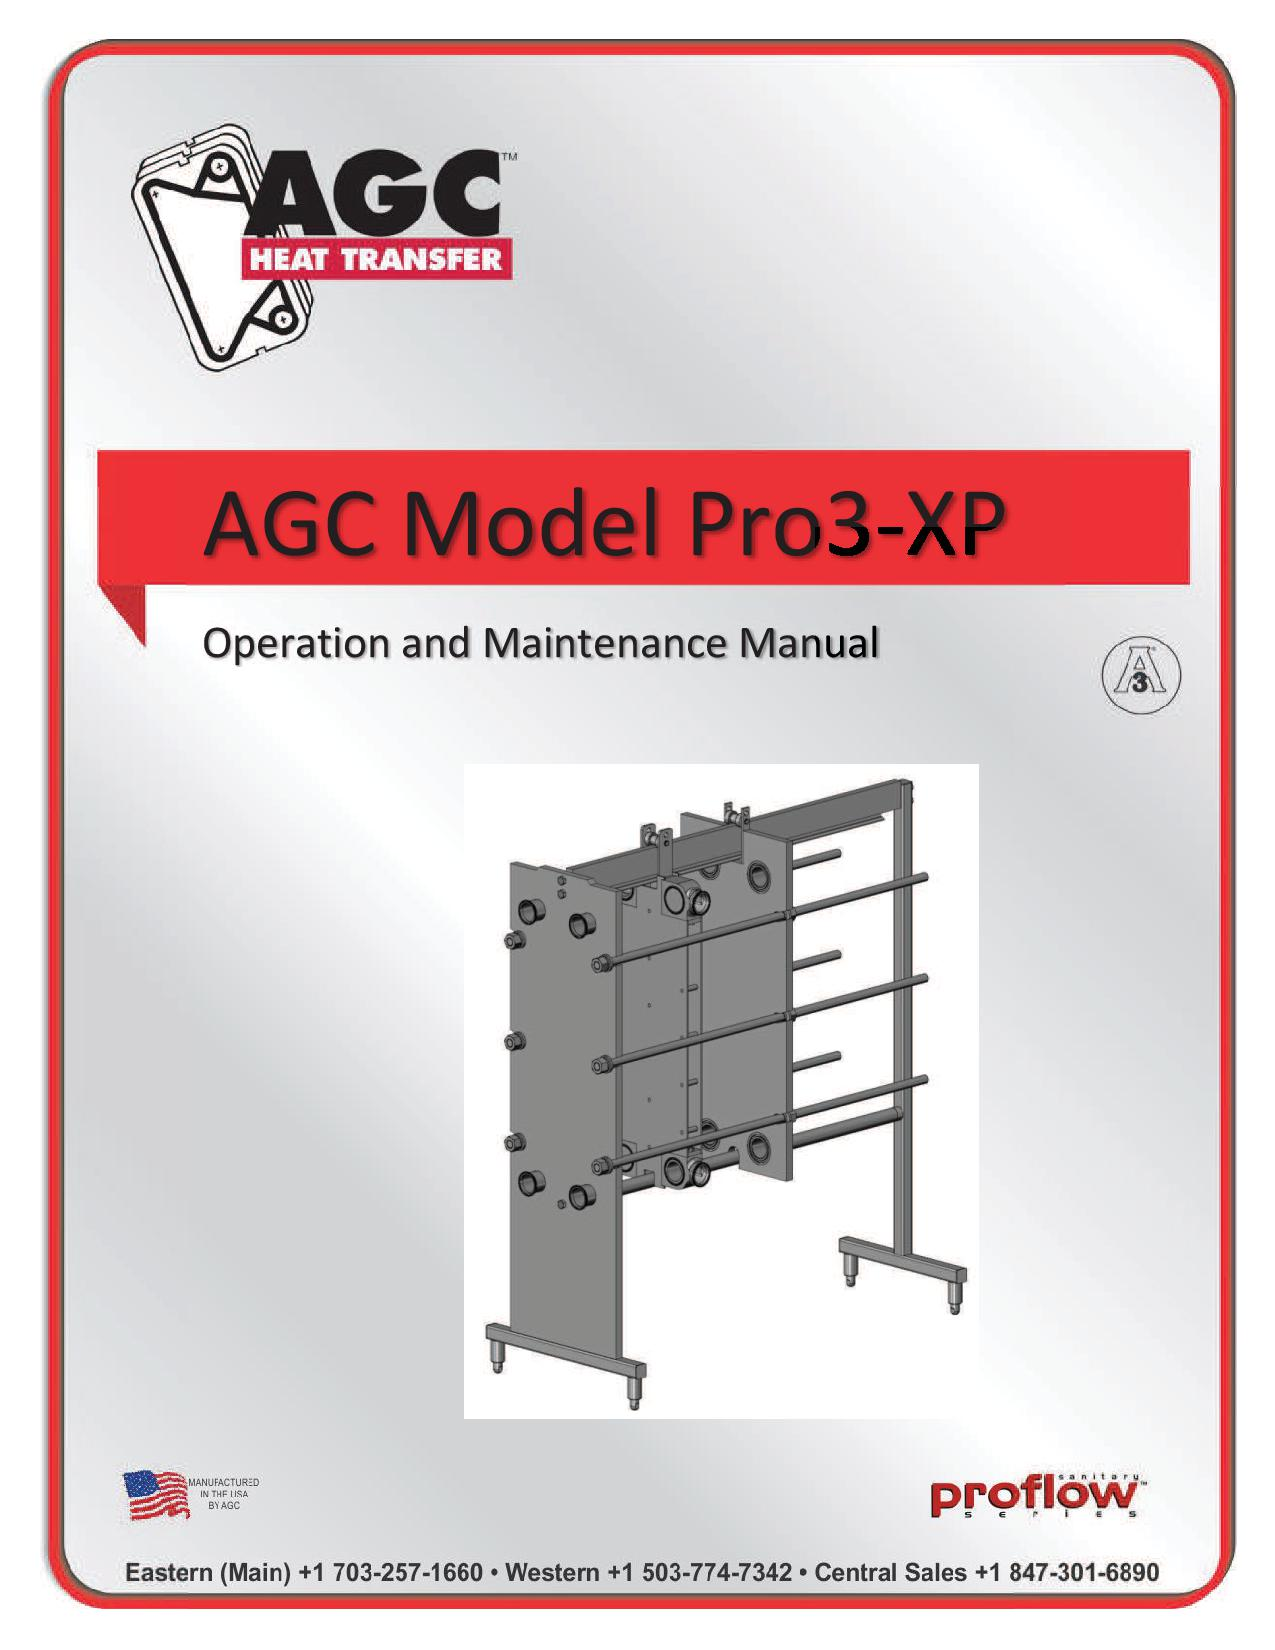 AGC Operating Manual Pro3-XP